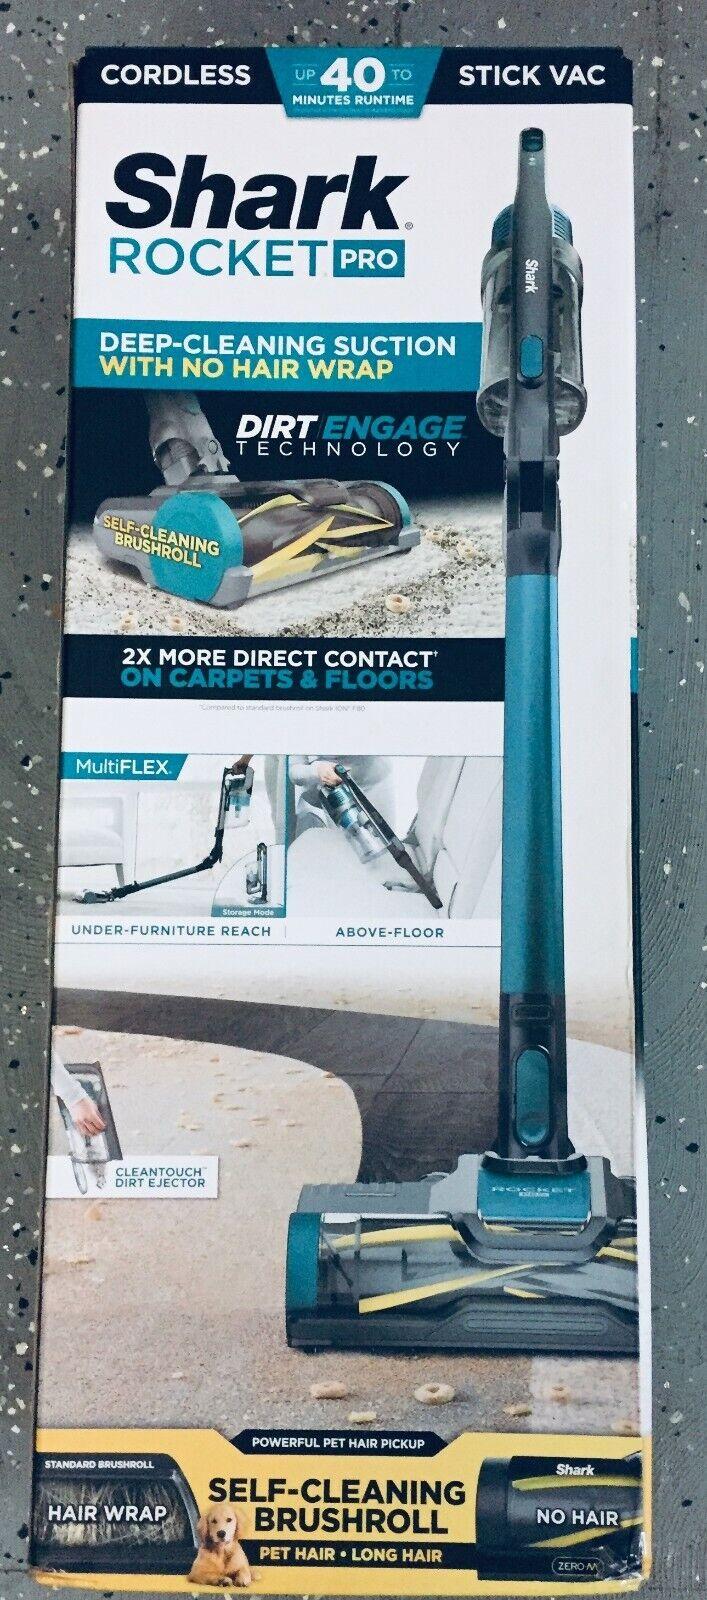 Shark Rocket Pro Cordless Stick Vac Vacuum IZ140 blue FAST F